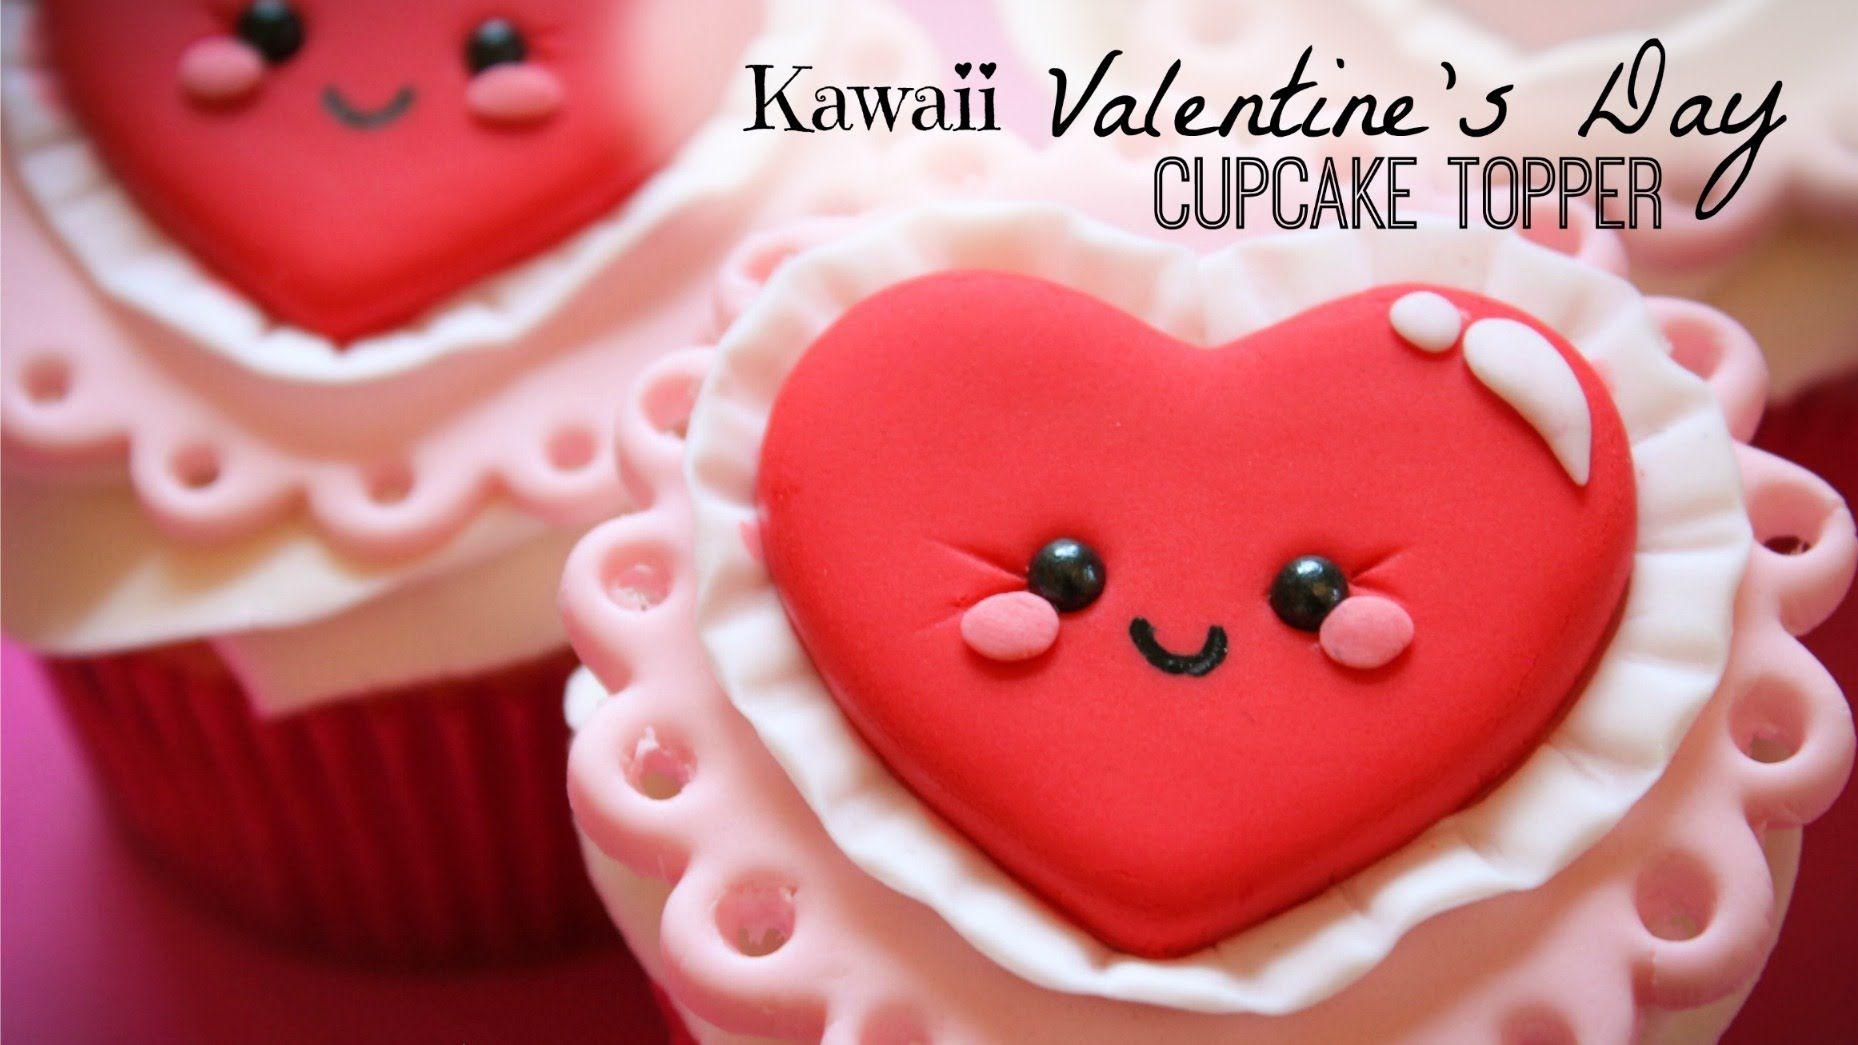 Kawaii Valentine S Day Cupcake Topper Nom Noms Pinterest